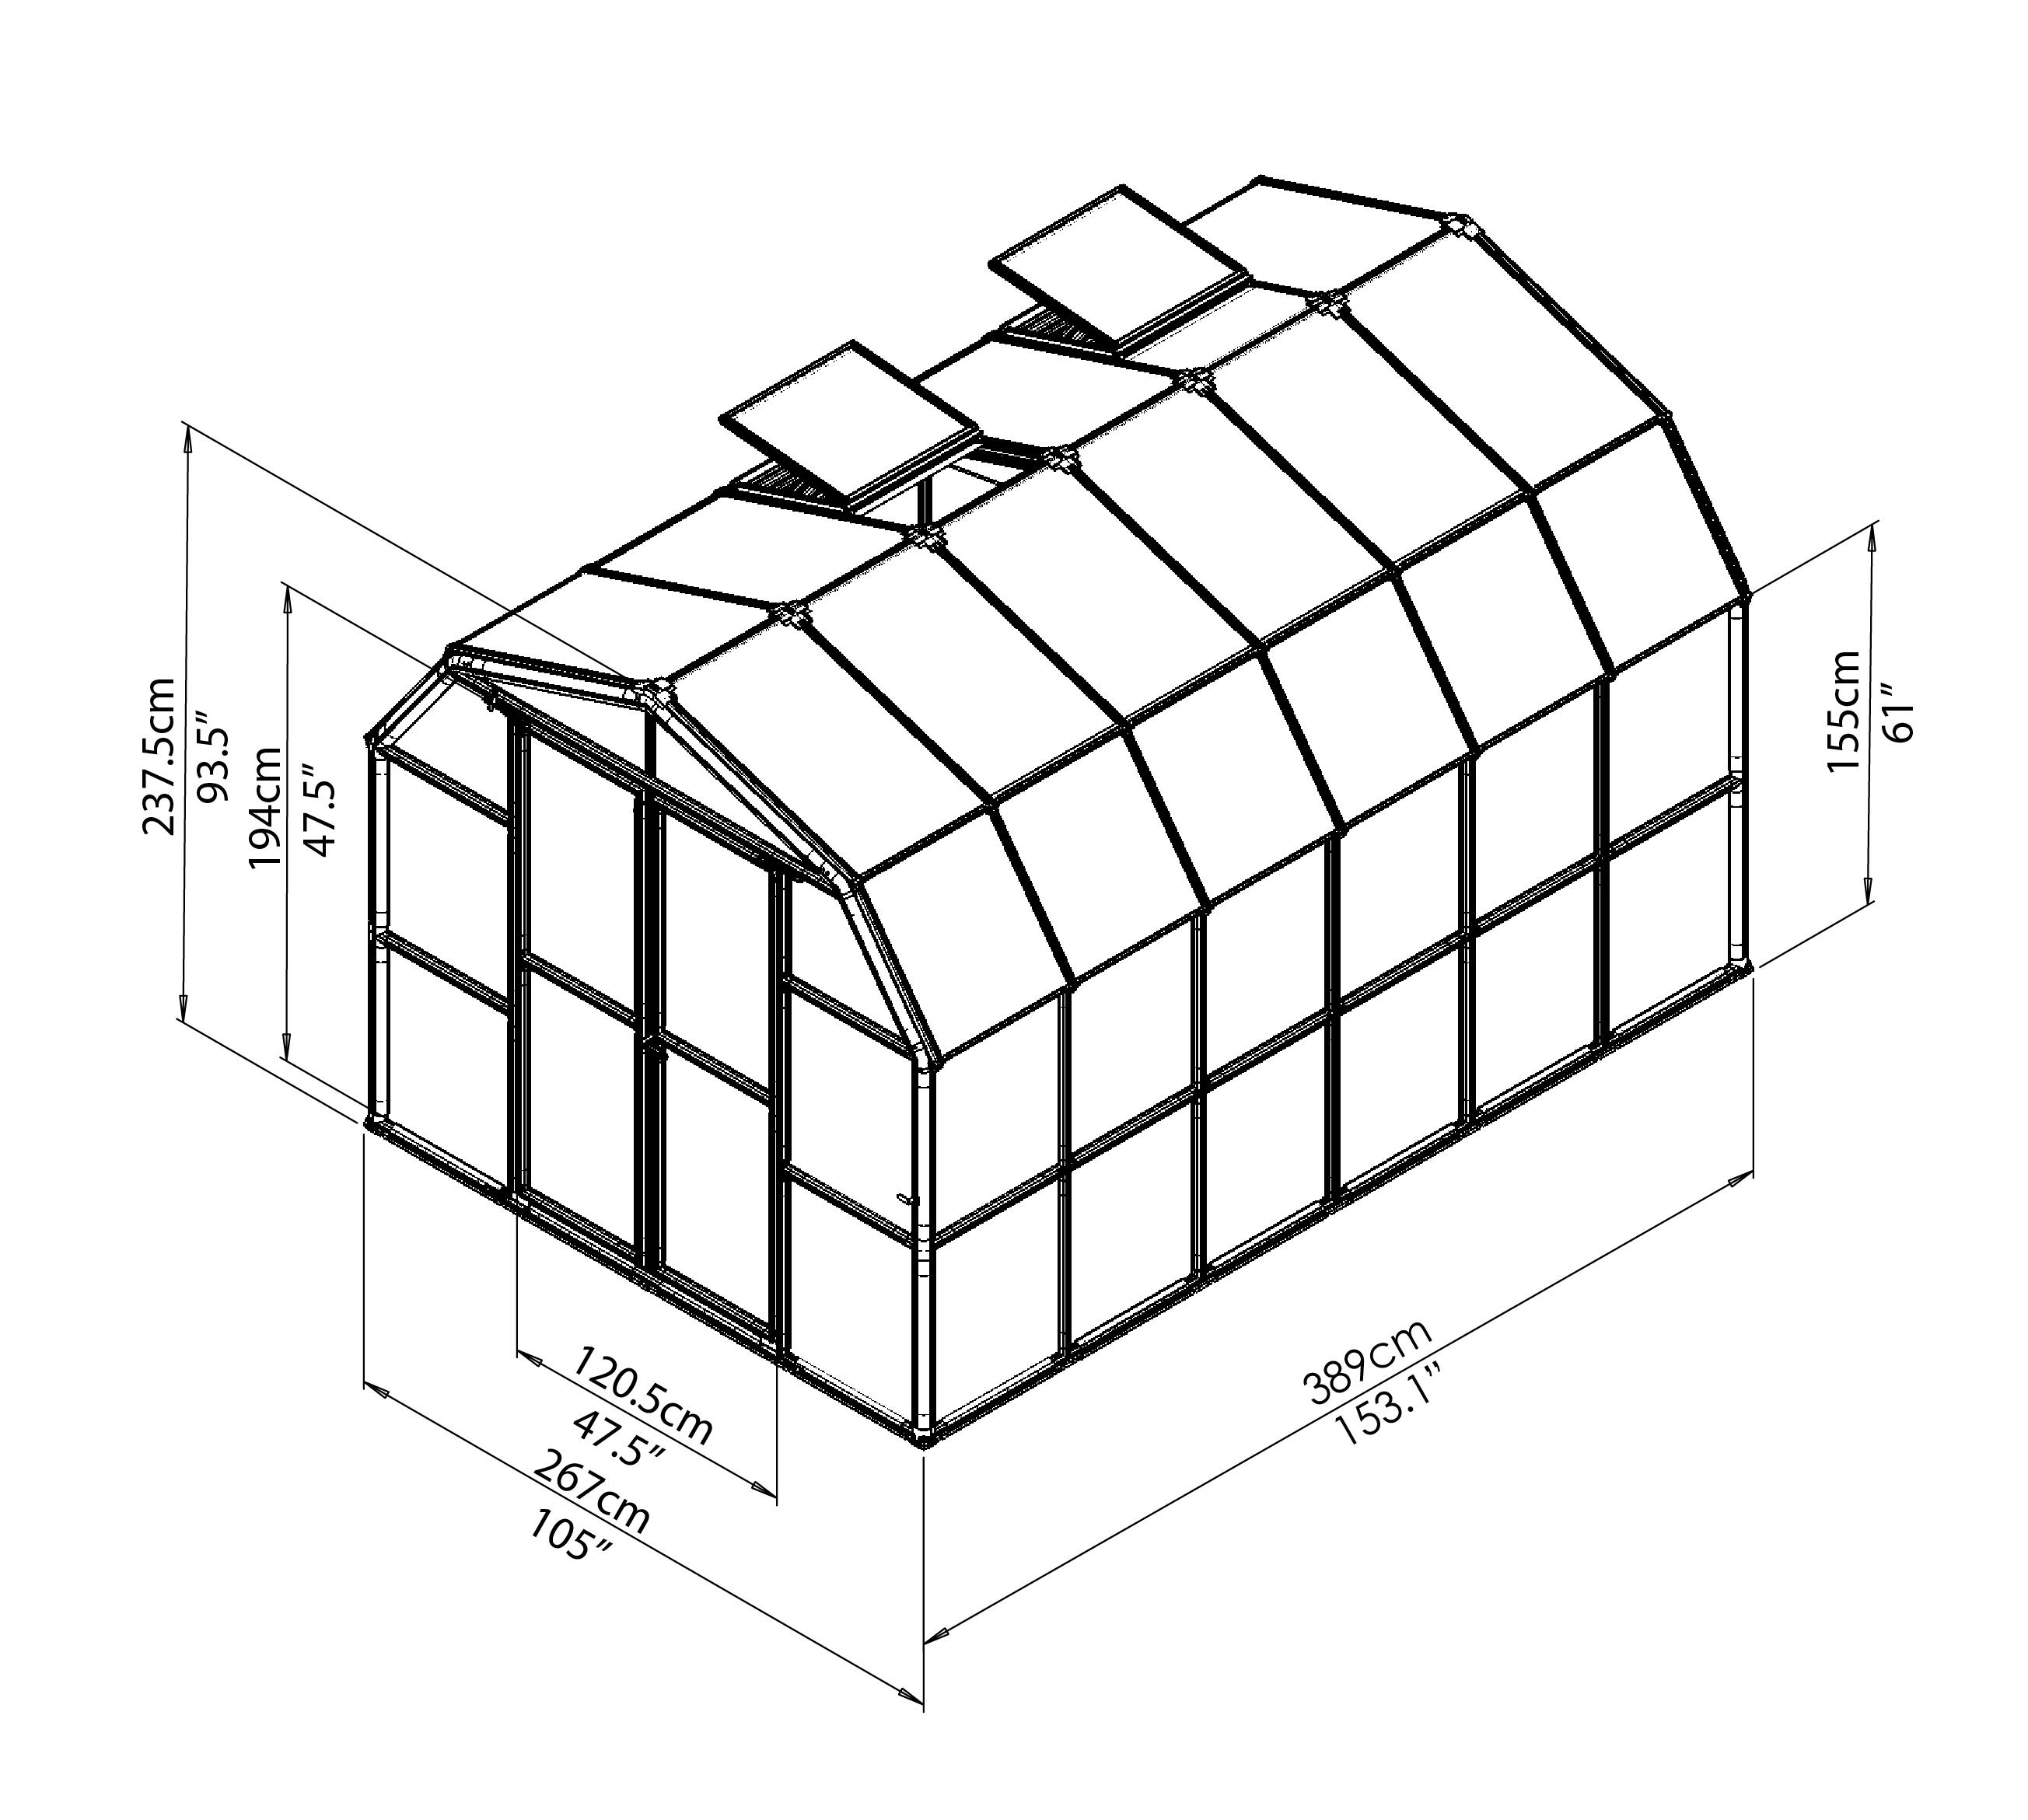 rion-greenhouses-grandgardener-prestige-opaque-8x12-drawing-isoview.jpg